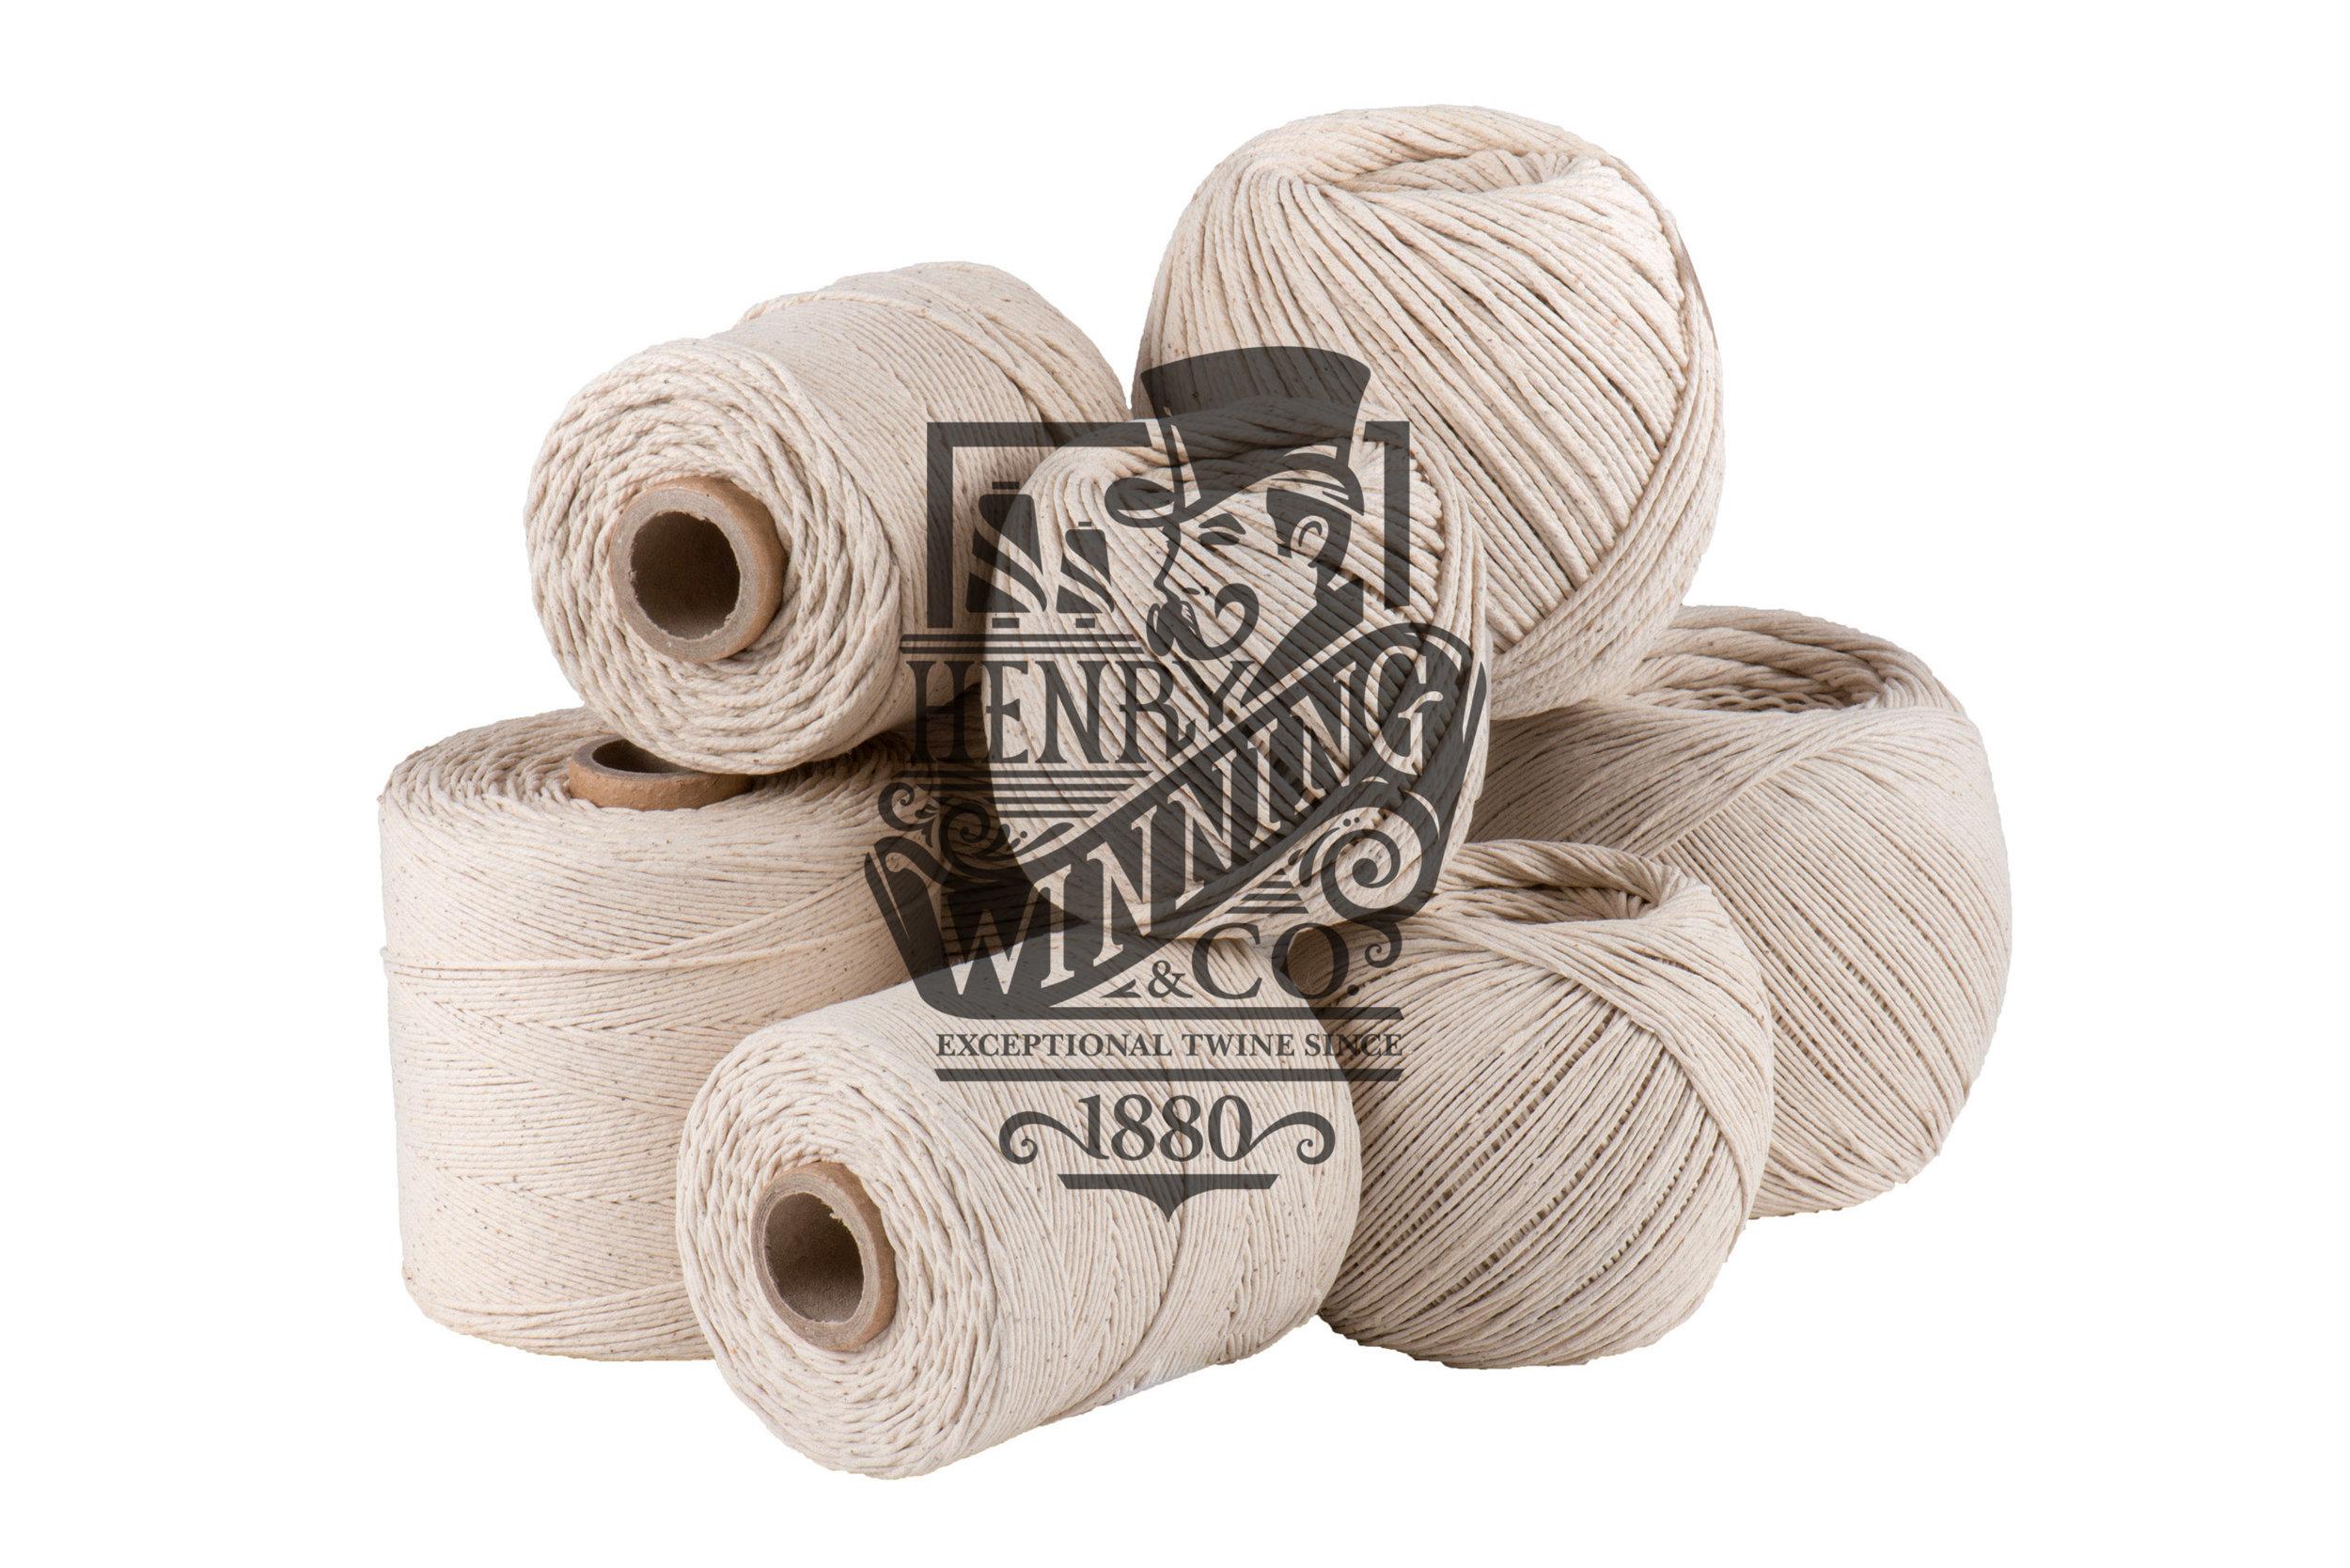 Henry Winning_Group Cotton Balls-Reels.jpg